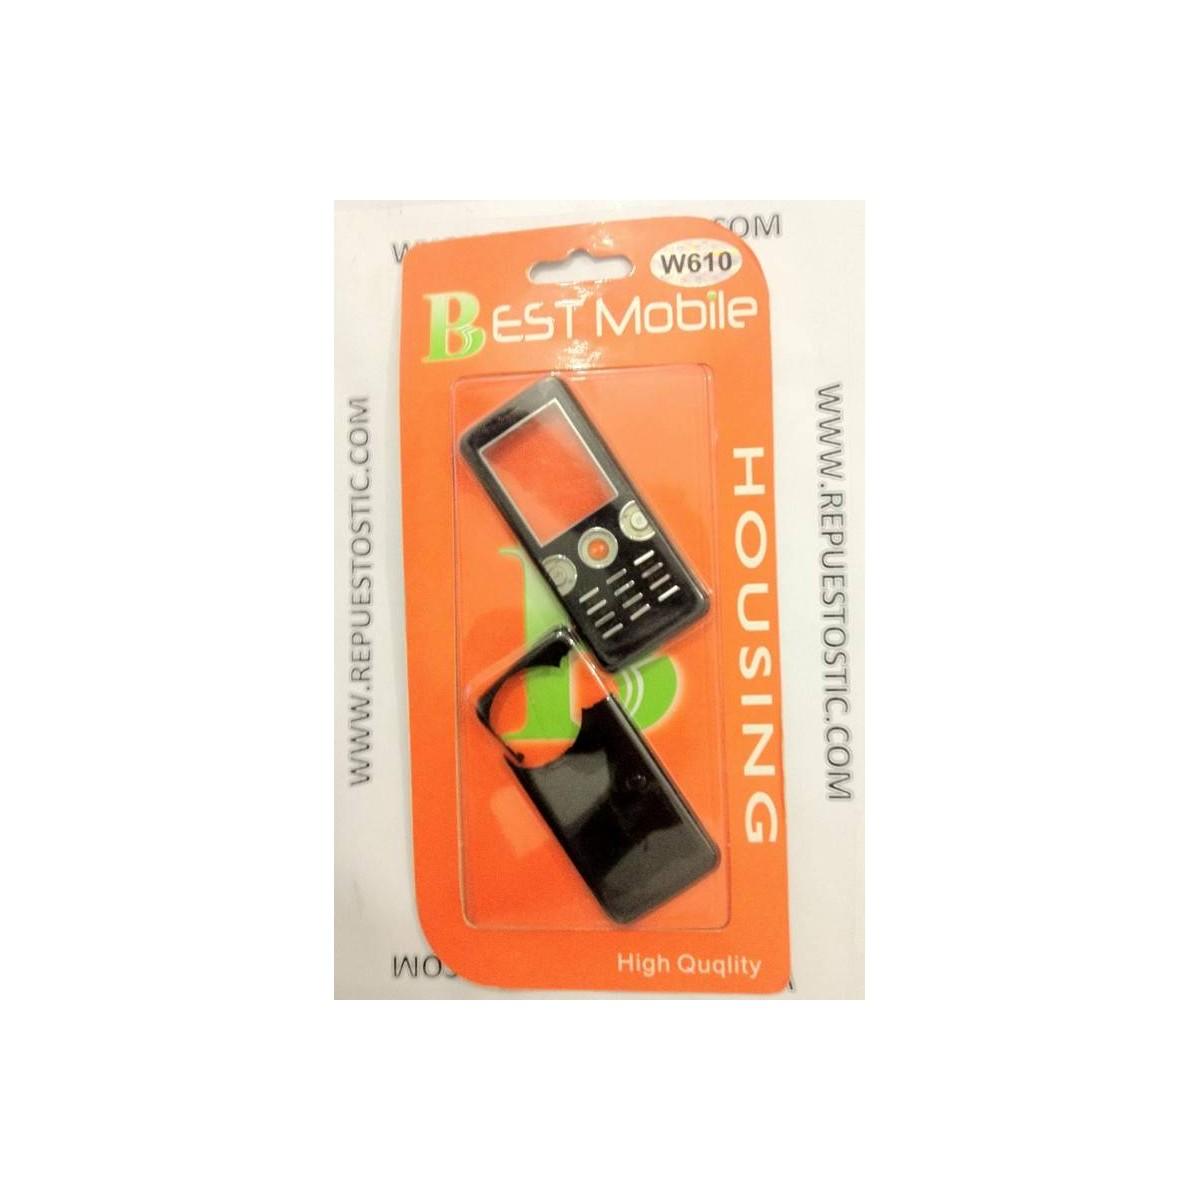 Carcasa Sony Ericsson W610 Negra